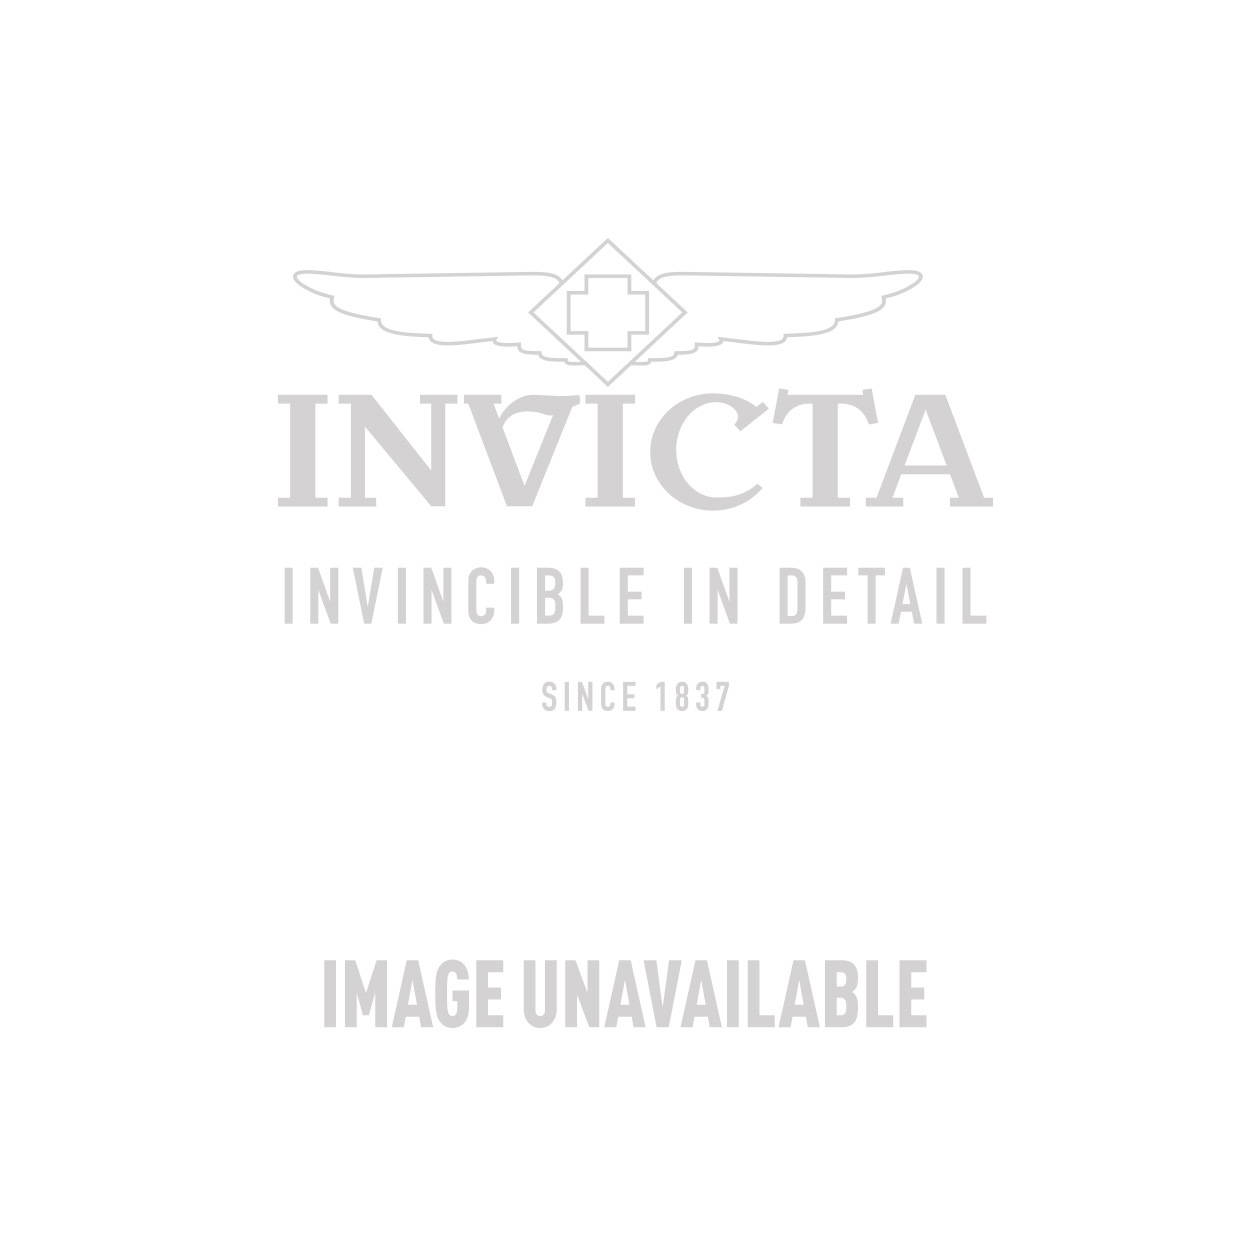 Invicta Russian Diver Swiss Movement Quartz Watch - Gold, Black case with Black tone Polyurethane band - Model 10137